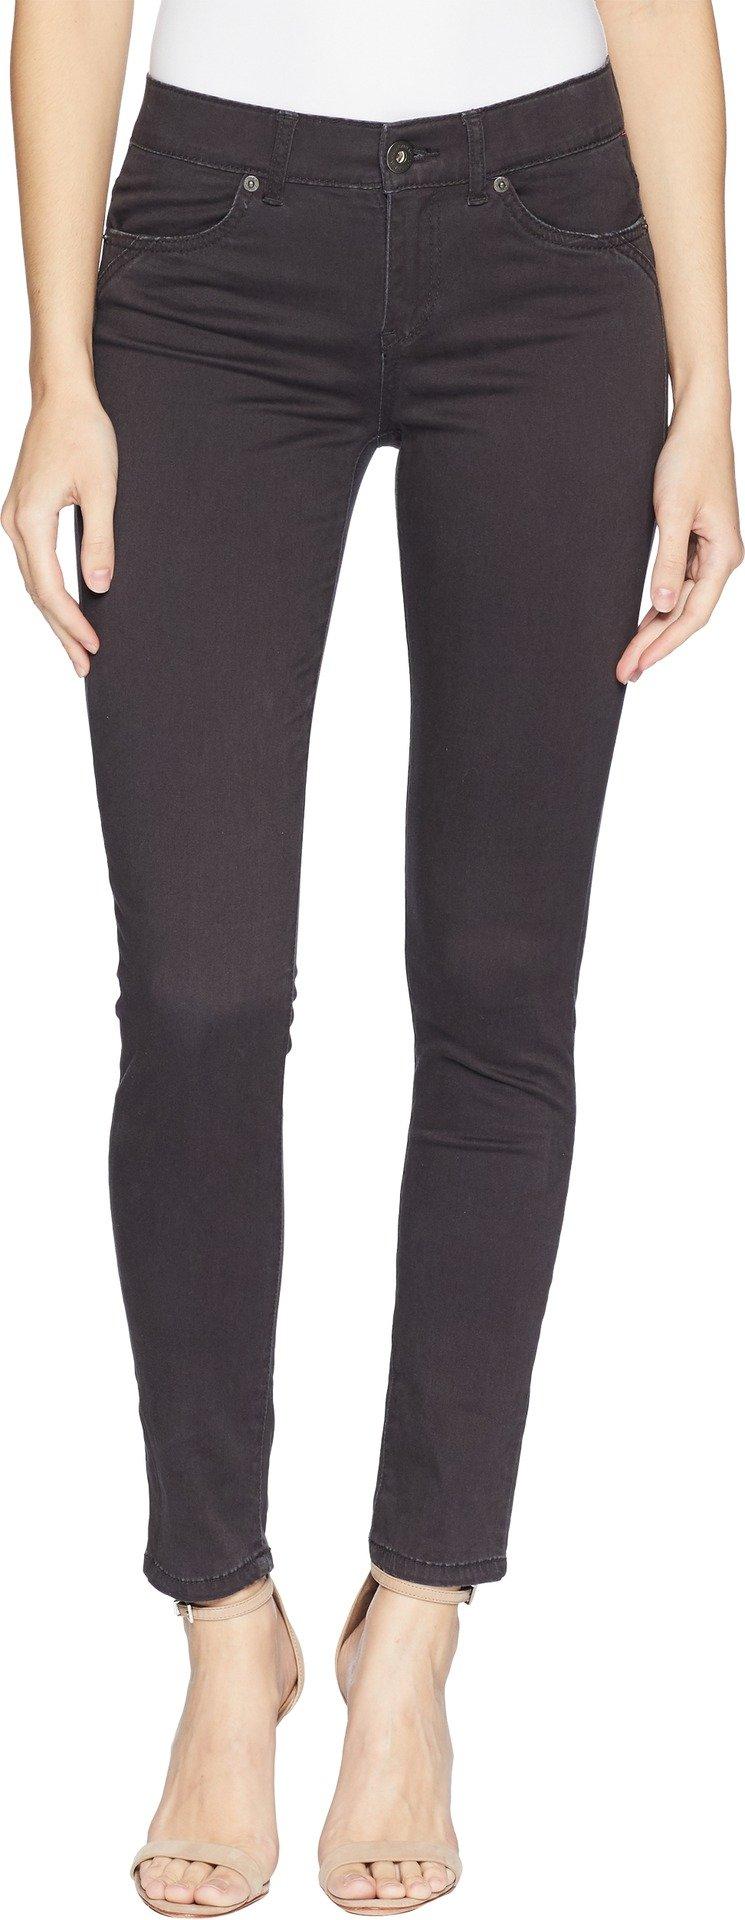 UNIONBAY Women's Karma Solid Skinny Pant, Dark Galaxy Grey, 7